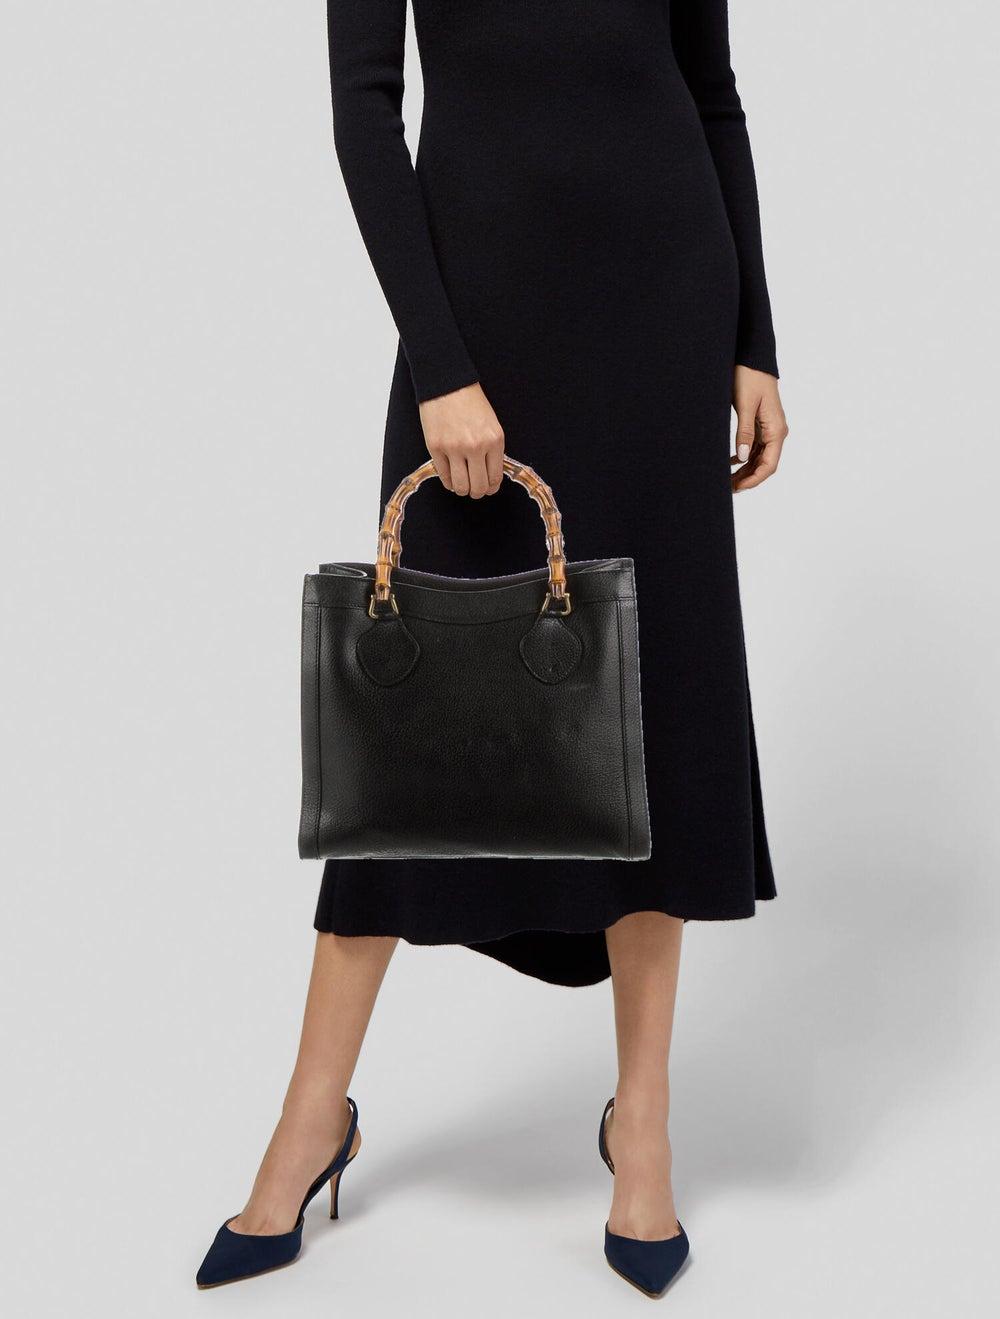 Gucci Vintage Diana Bamboo Tote Black - image 2